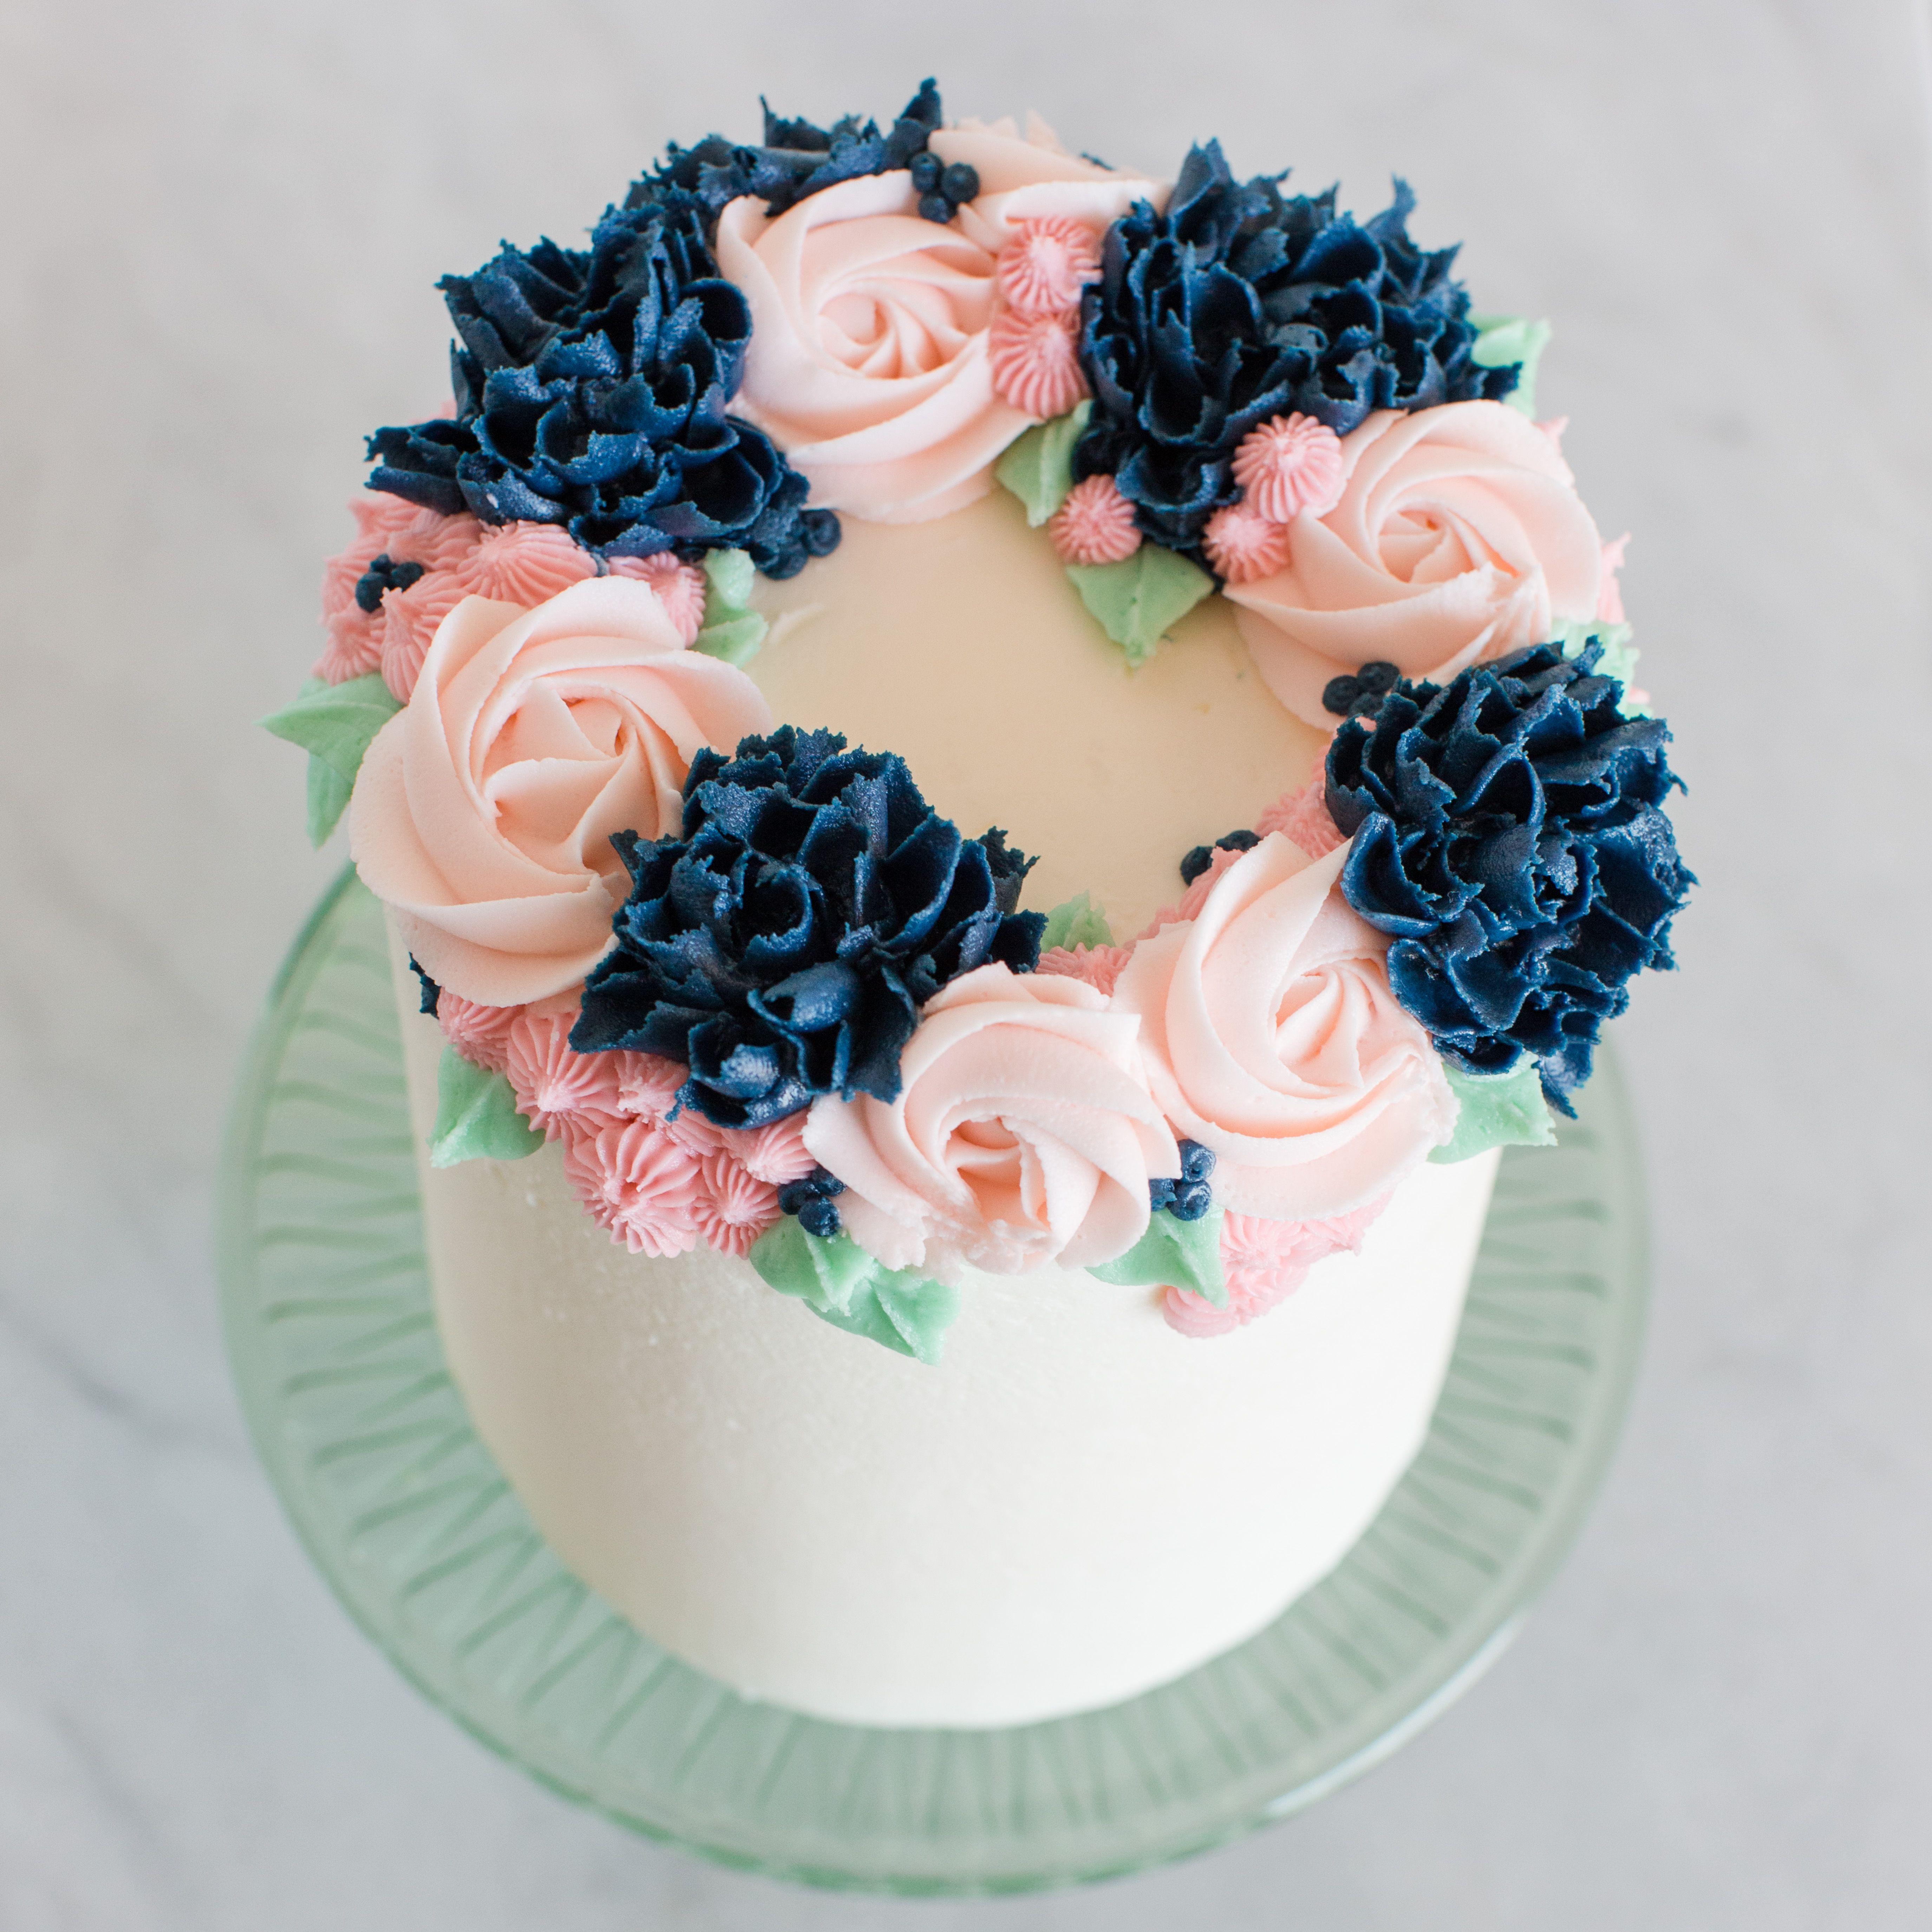 Flower Market Flower Cake Happy Birthday Flower Cake Floral Cake